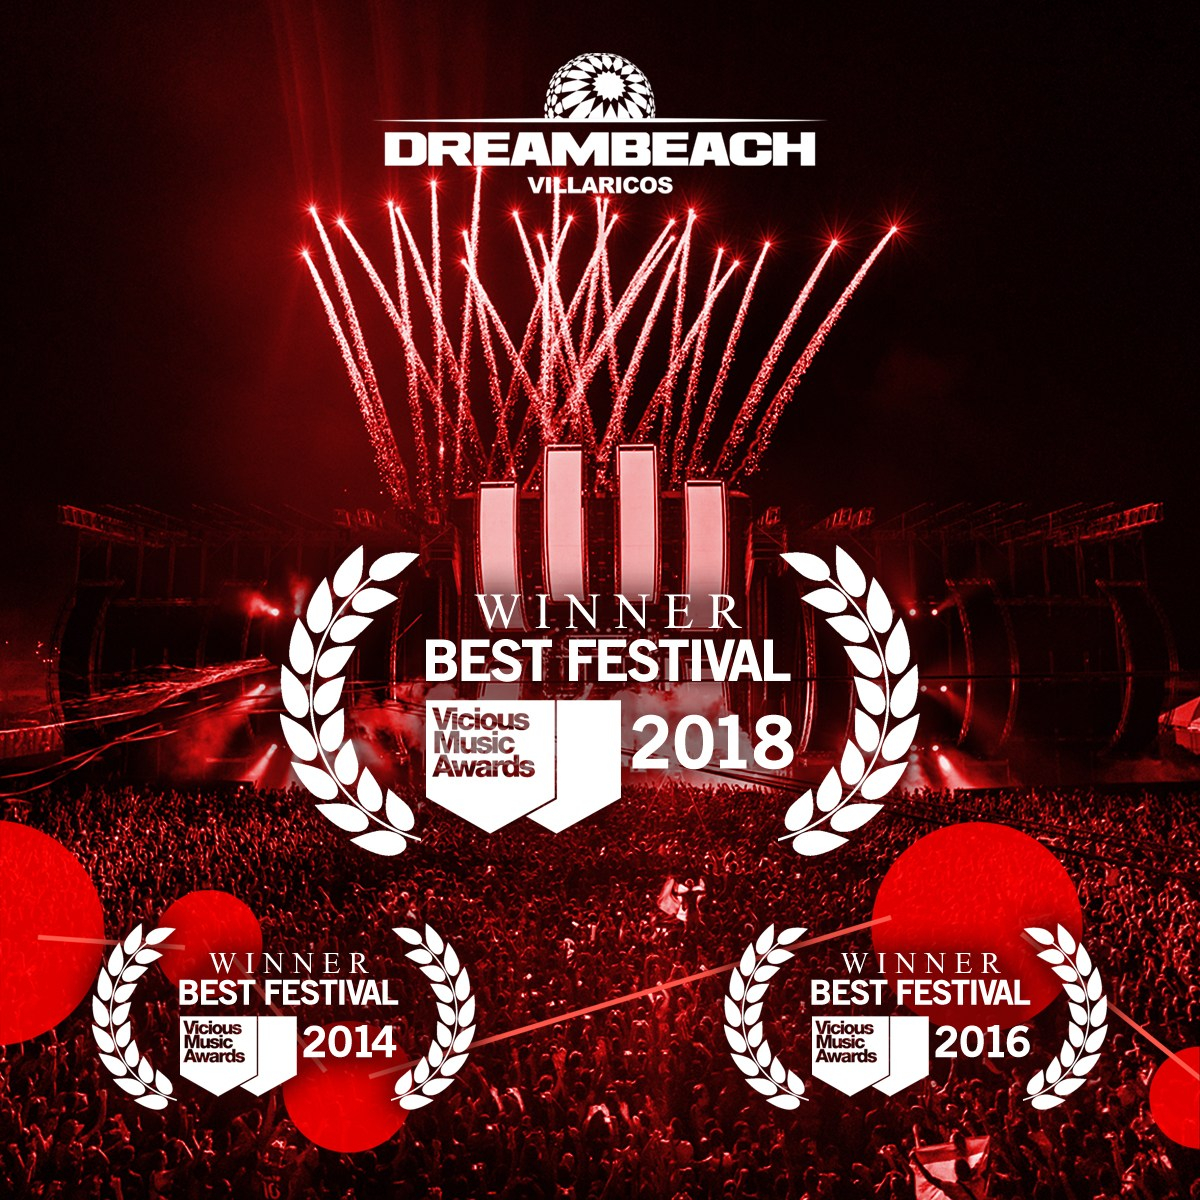 Festival Dreambeach Villaricos